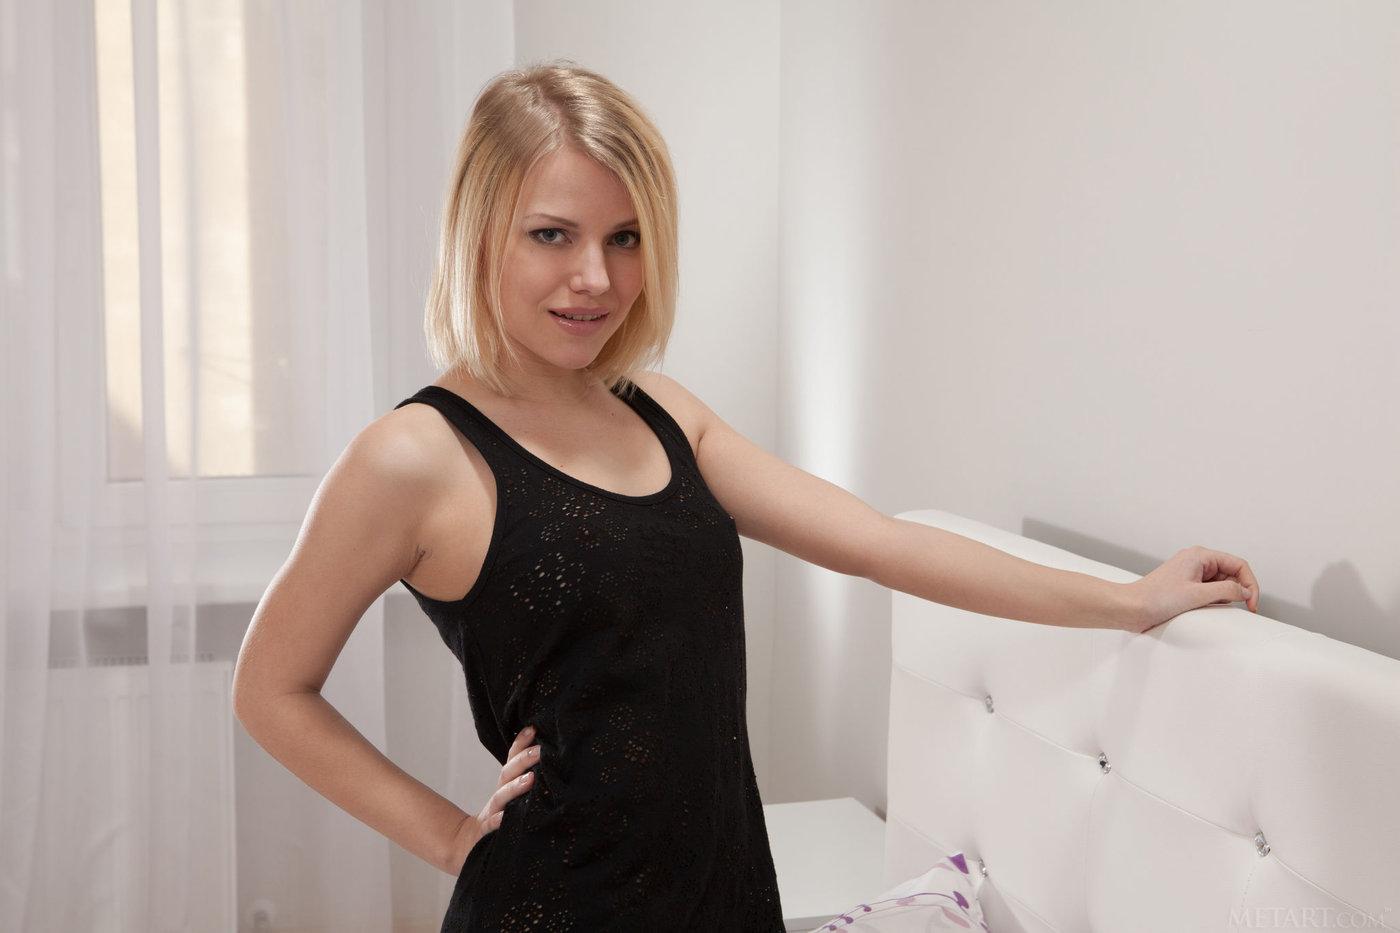 blacks fucking blonde pussy